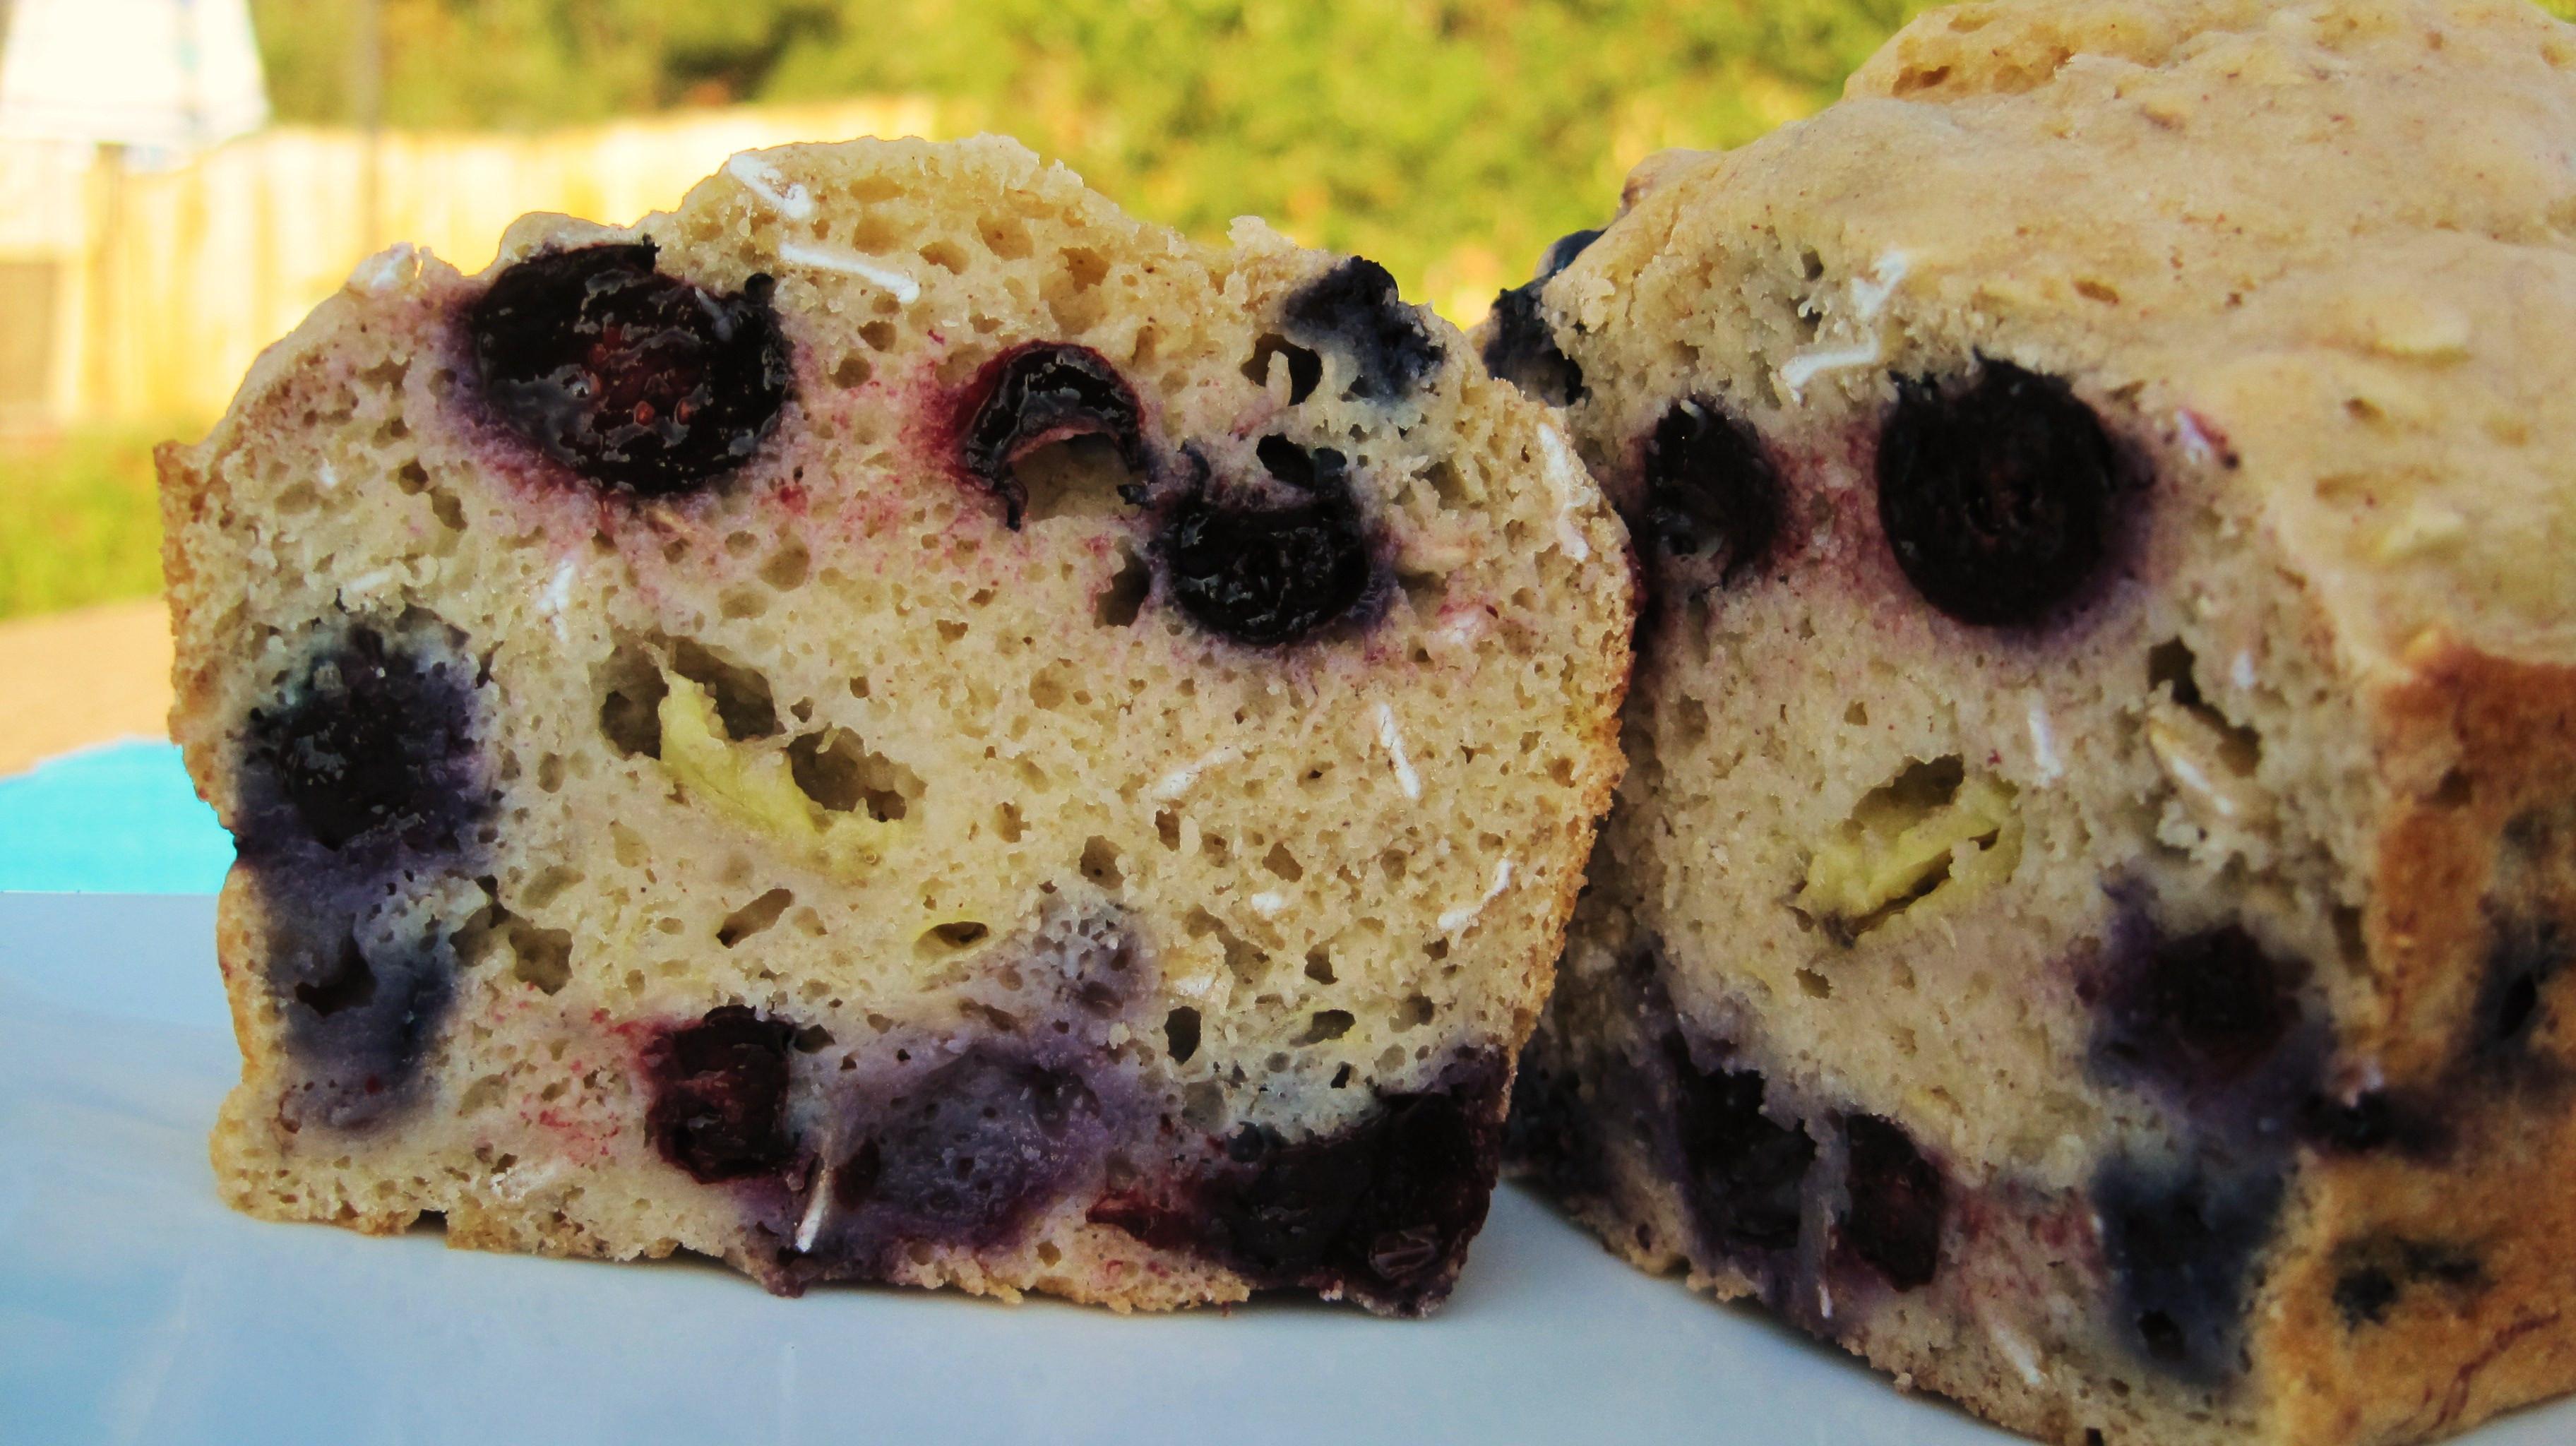 Healthy Banana Blueberry Bread Best 20 Healthy Banana Blueberry Bread & A Tasty Flop